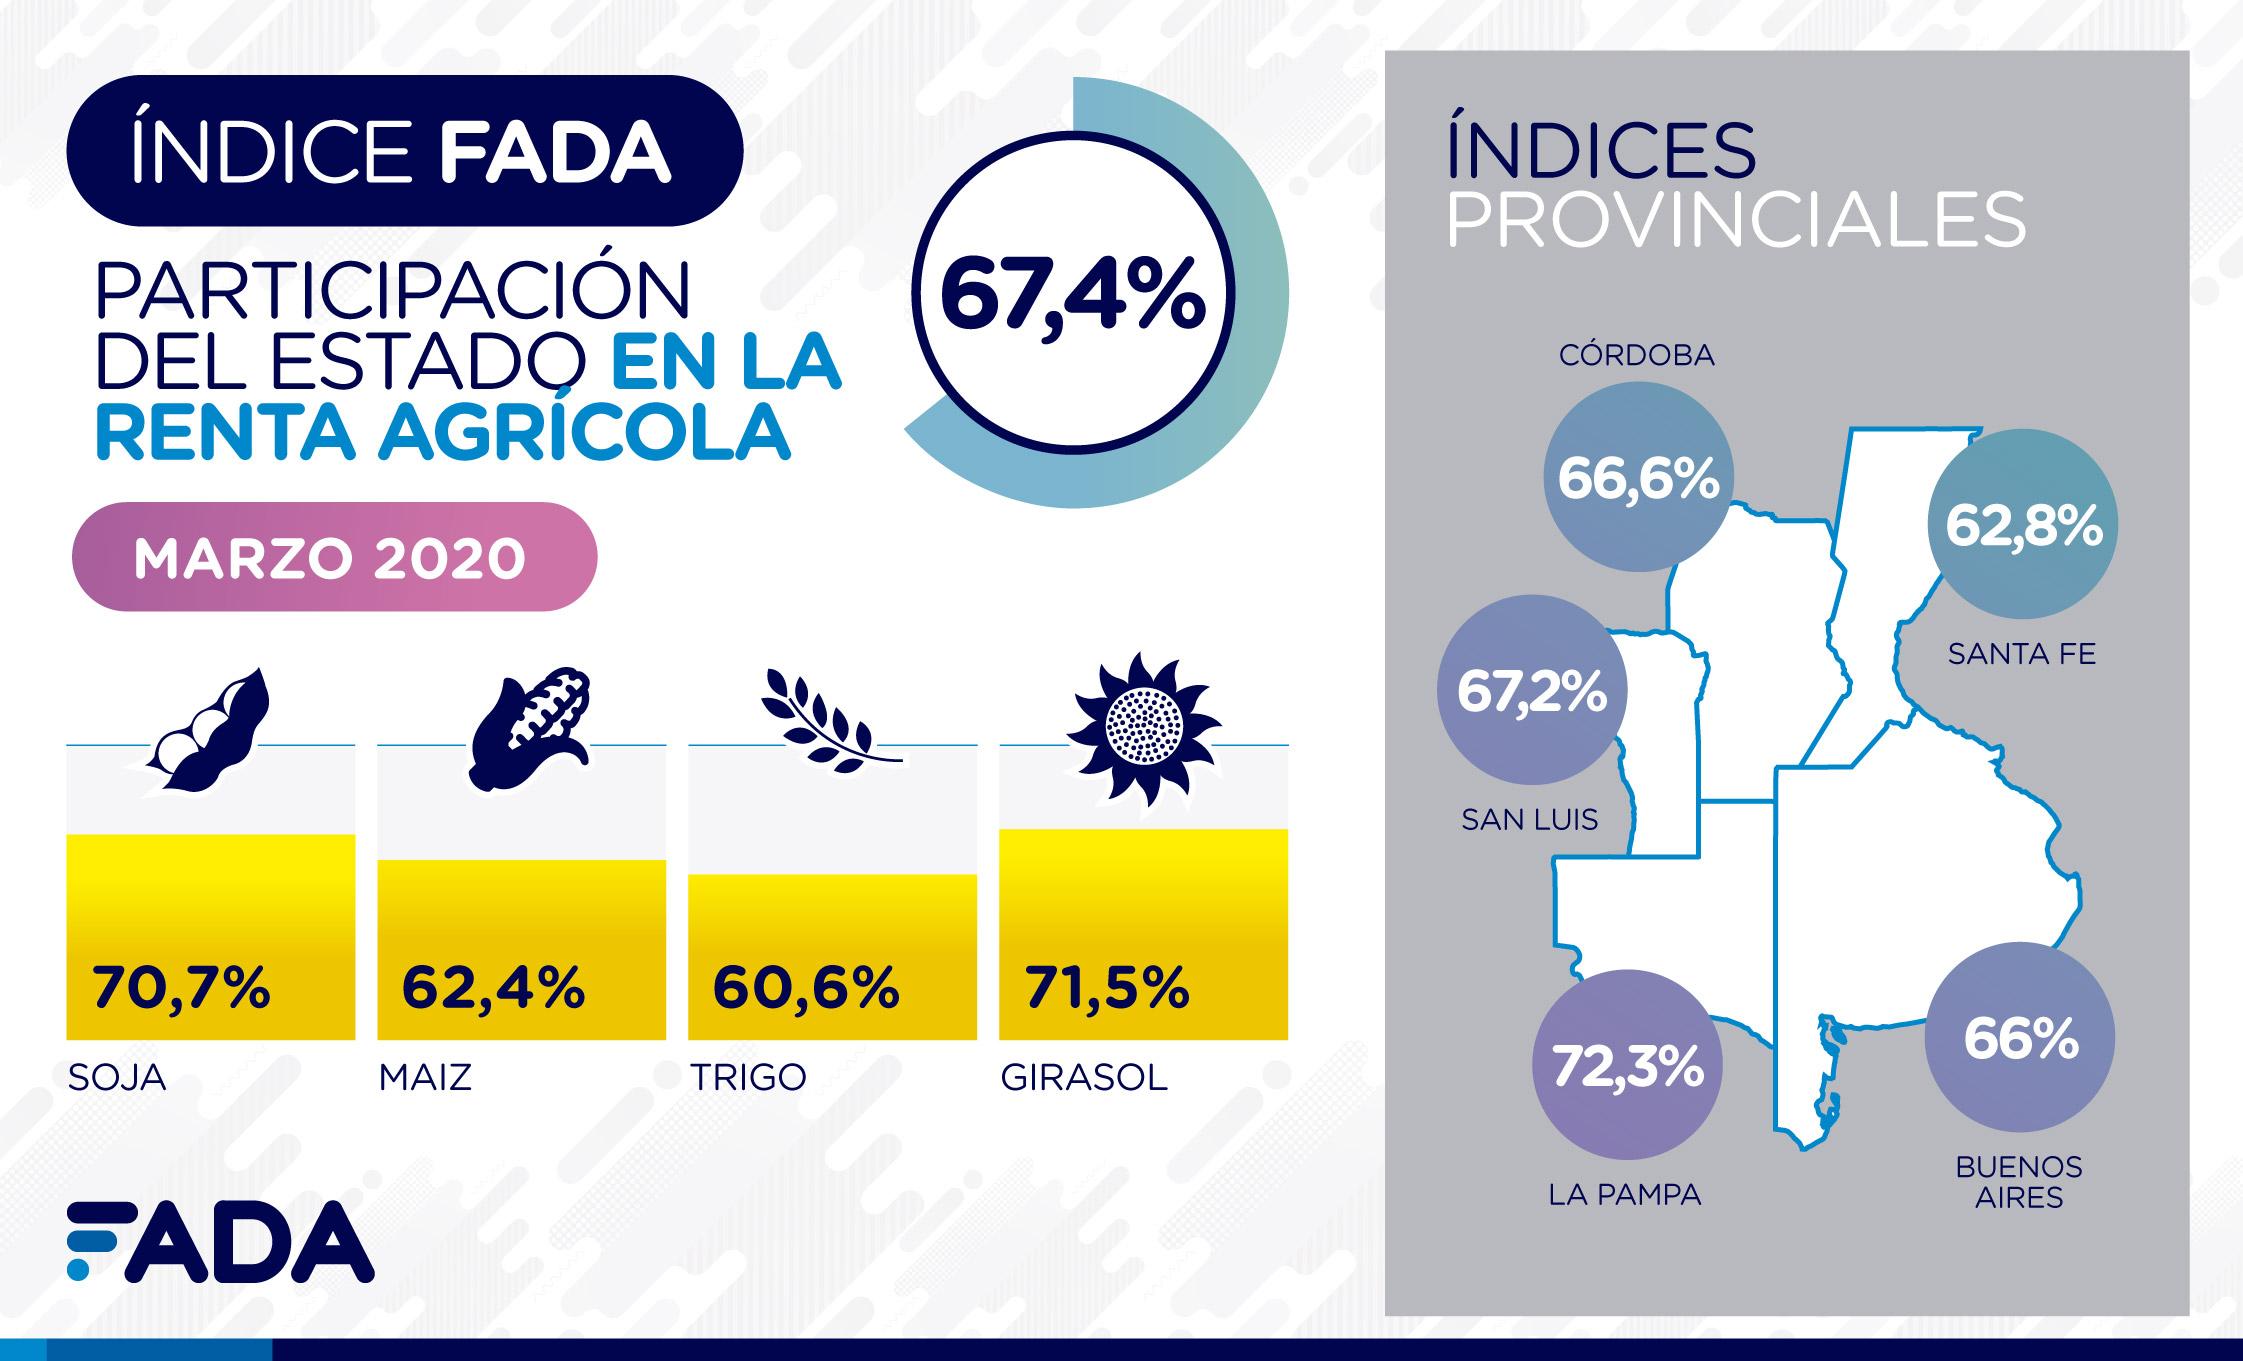 Índice FADA de Marzo 2020: 67,4%